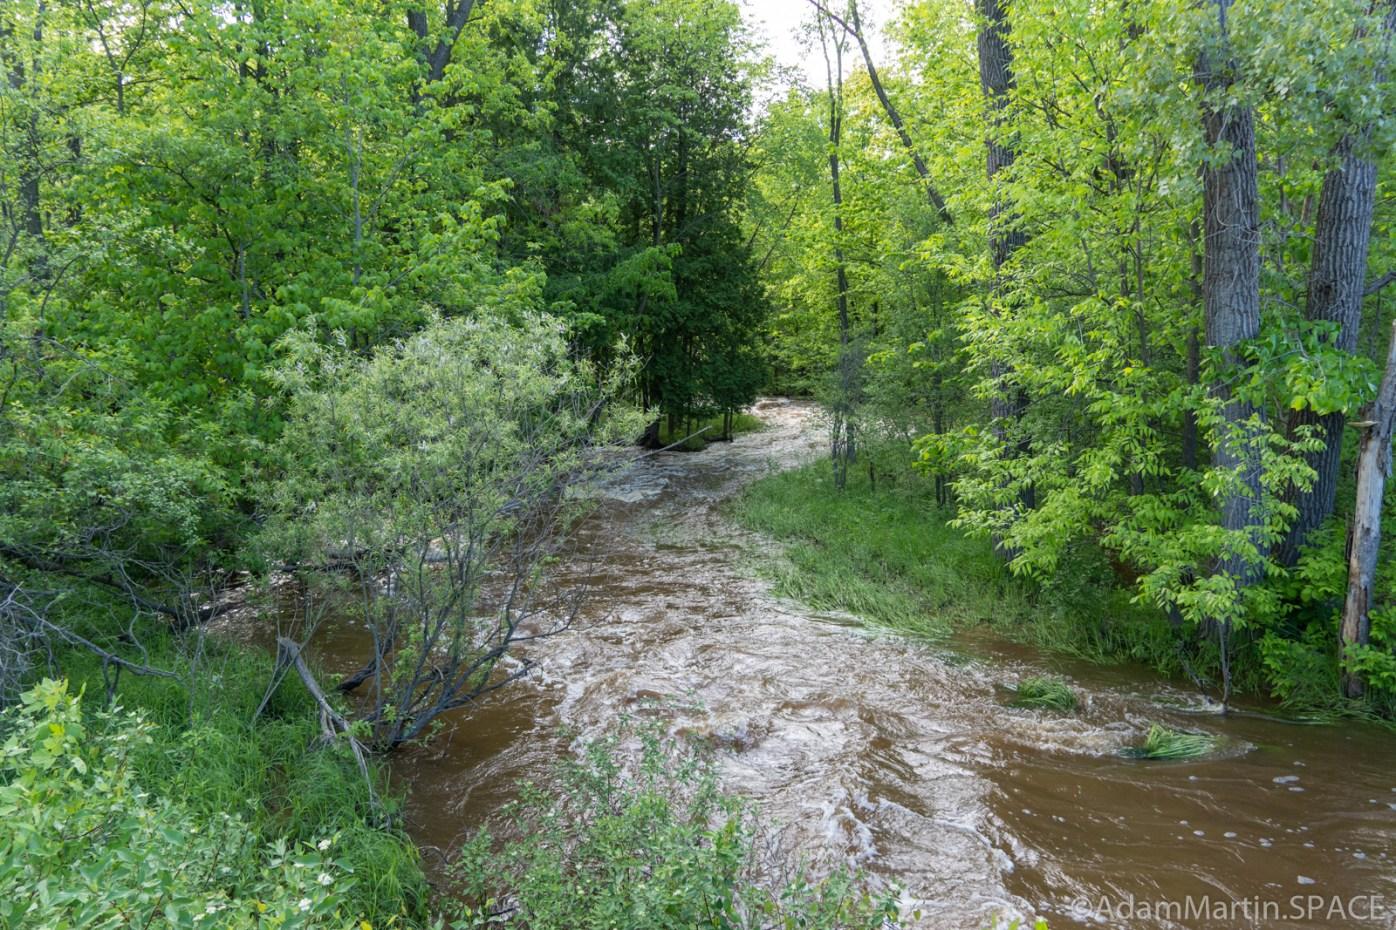 Baird Creek - High waters along the creek